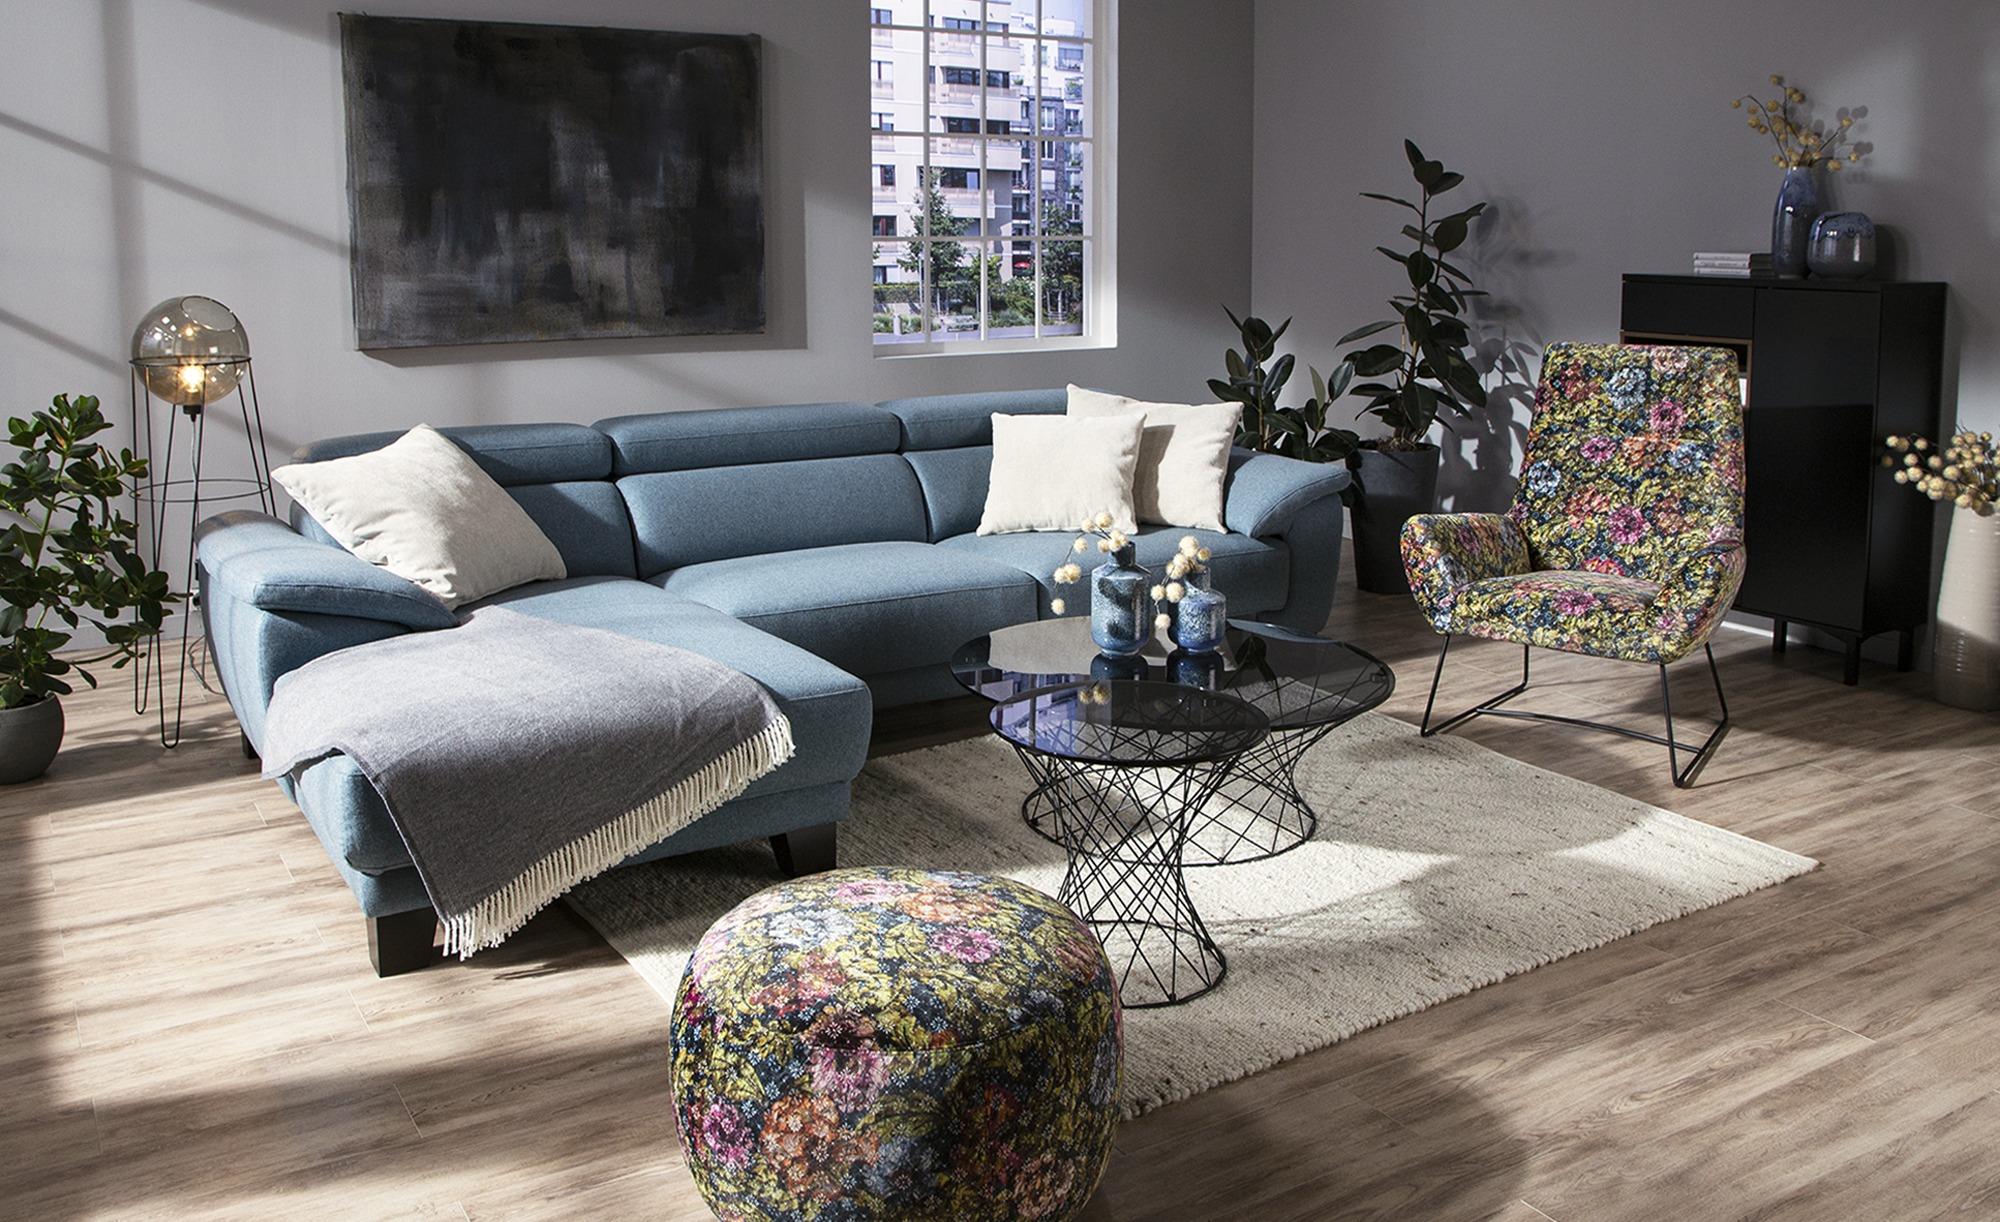 Max Schelling Sessel  Master ¦ mehrfarbig ¦ Maße (cm): B: 82 H: 102 T: 81 Polstermöbel > Sessel > Polstersessel - Höffner